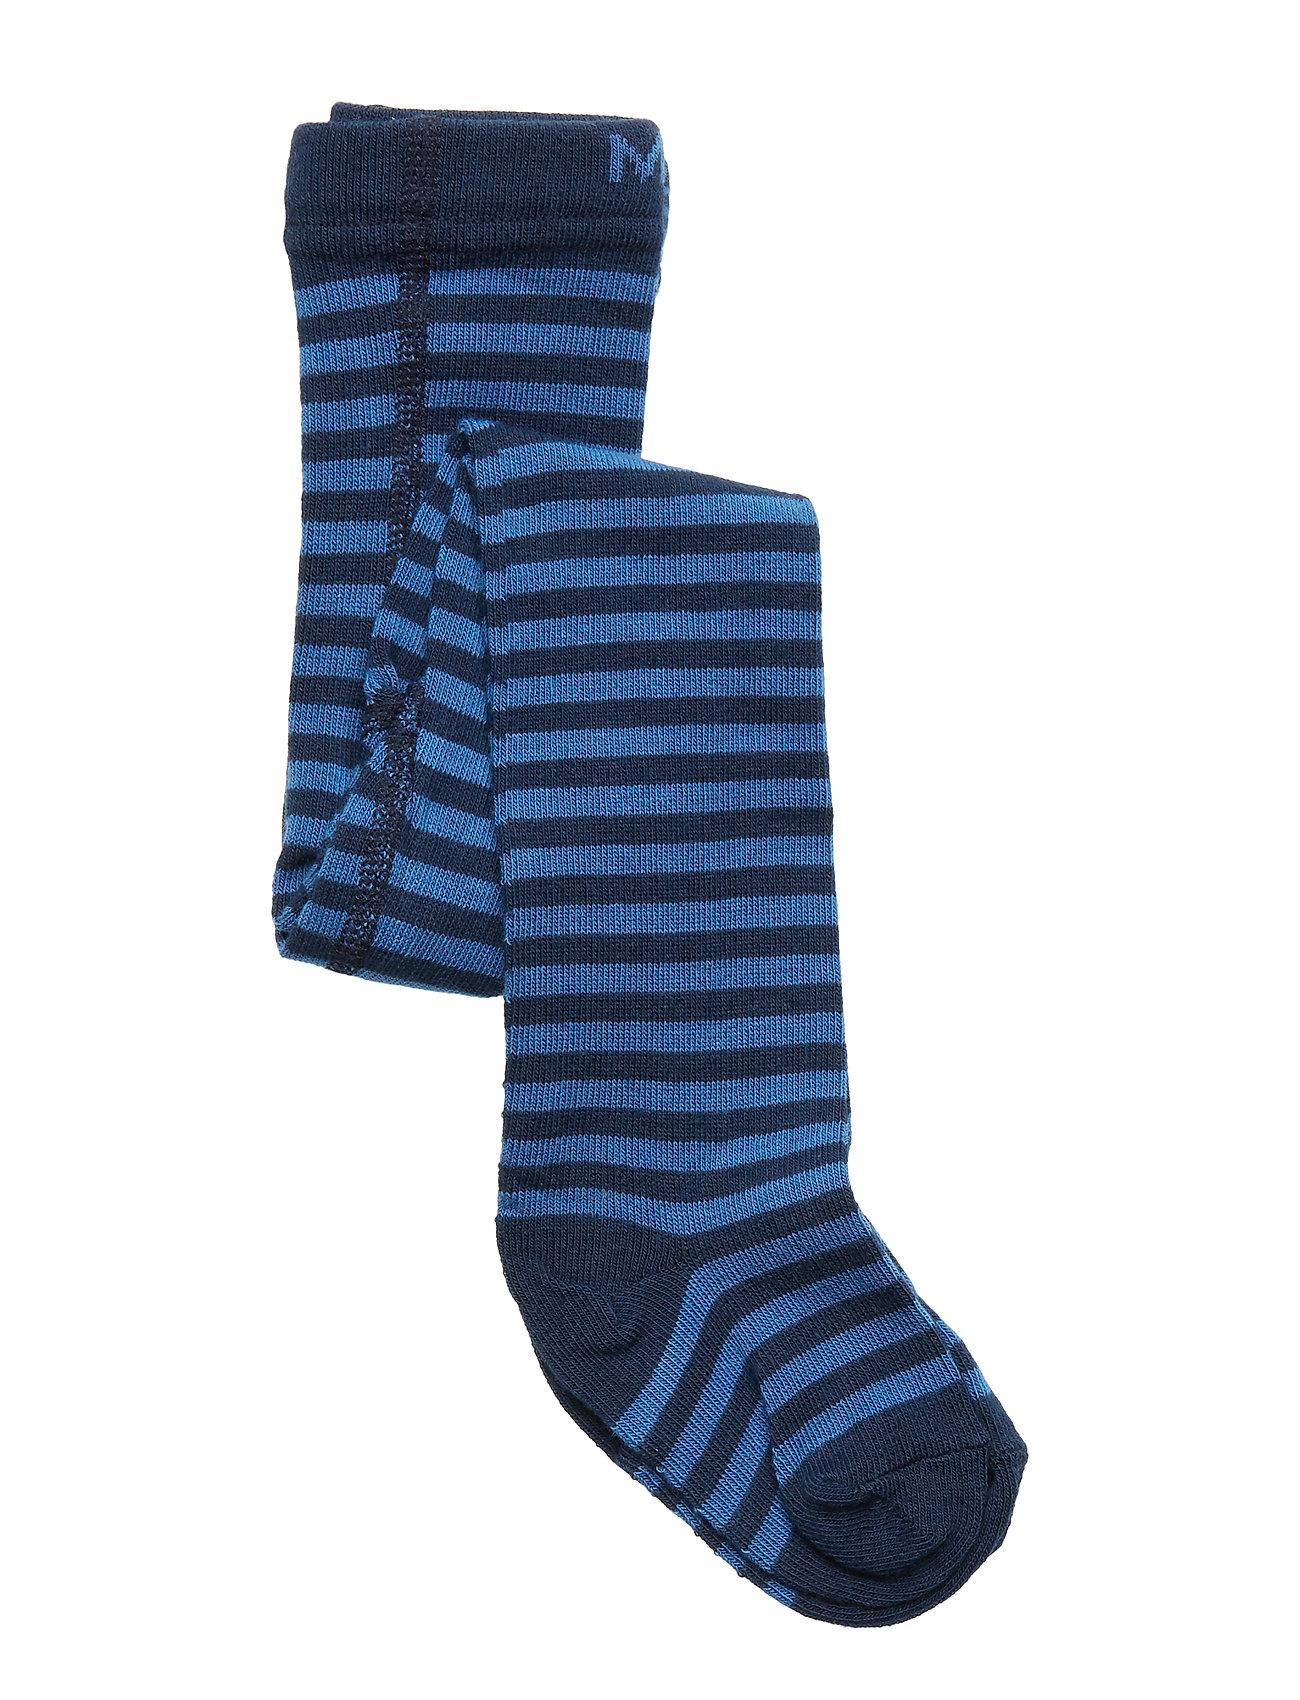 Melton Babytights - New Stripes - 239 DELFT BLUE